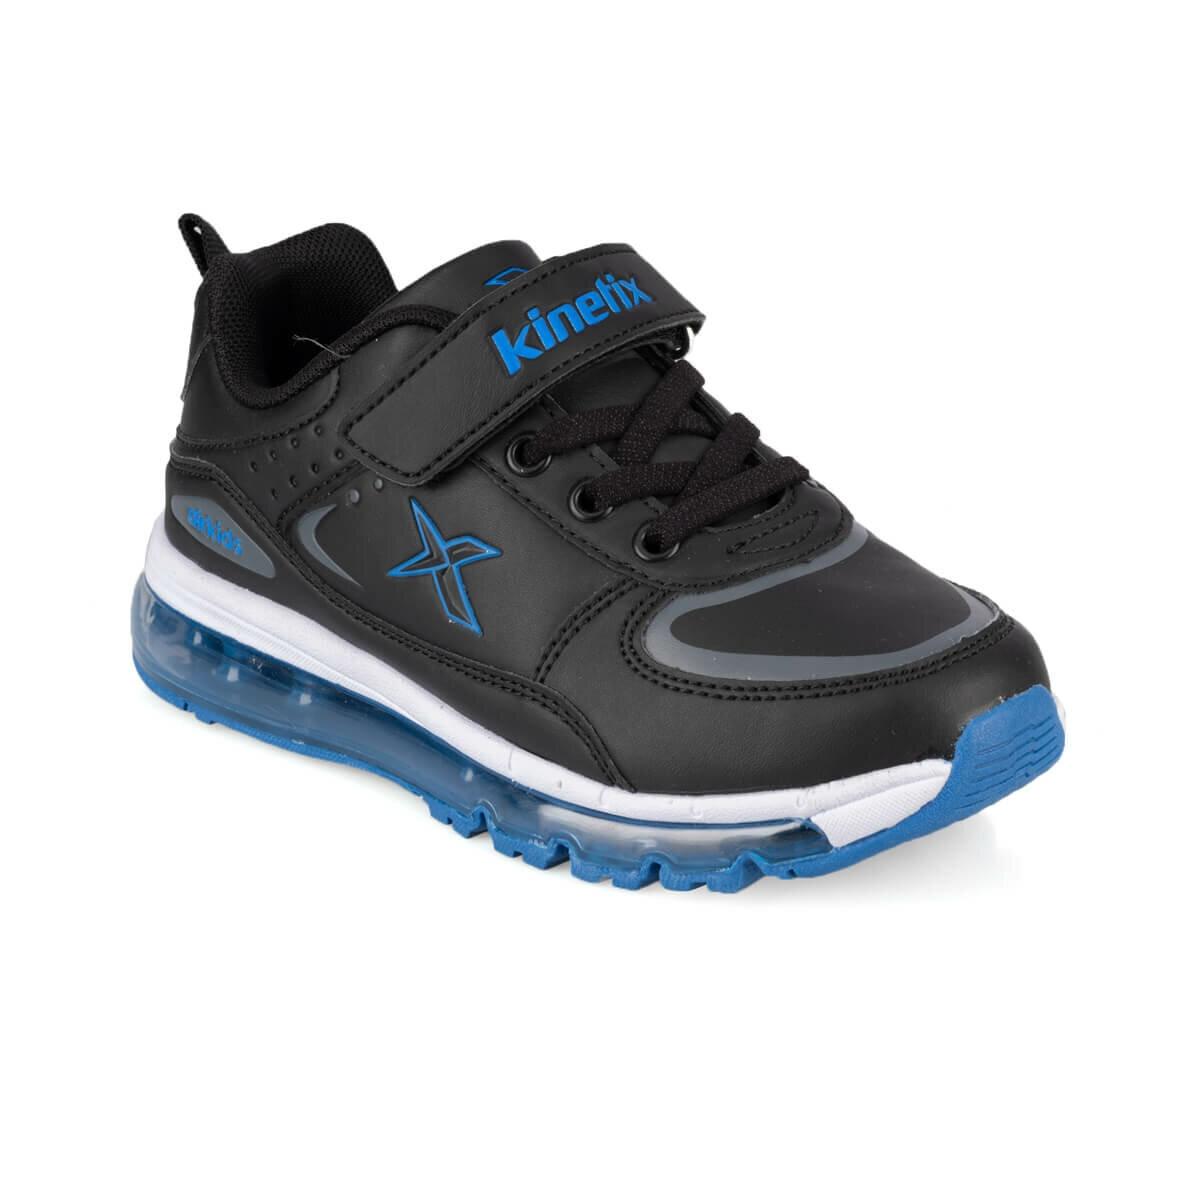 FLO LONAIR 9PR Black Male Child Running Shoes KINETIX